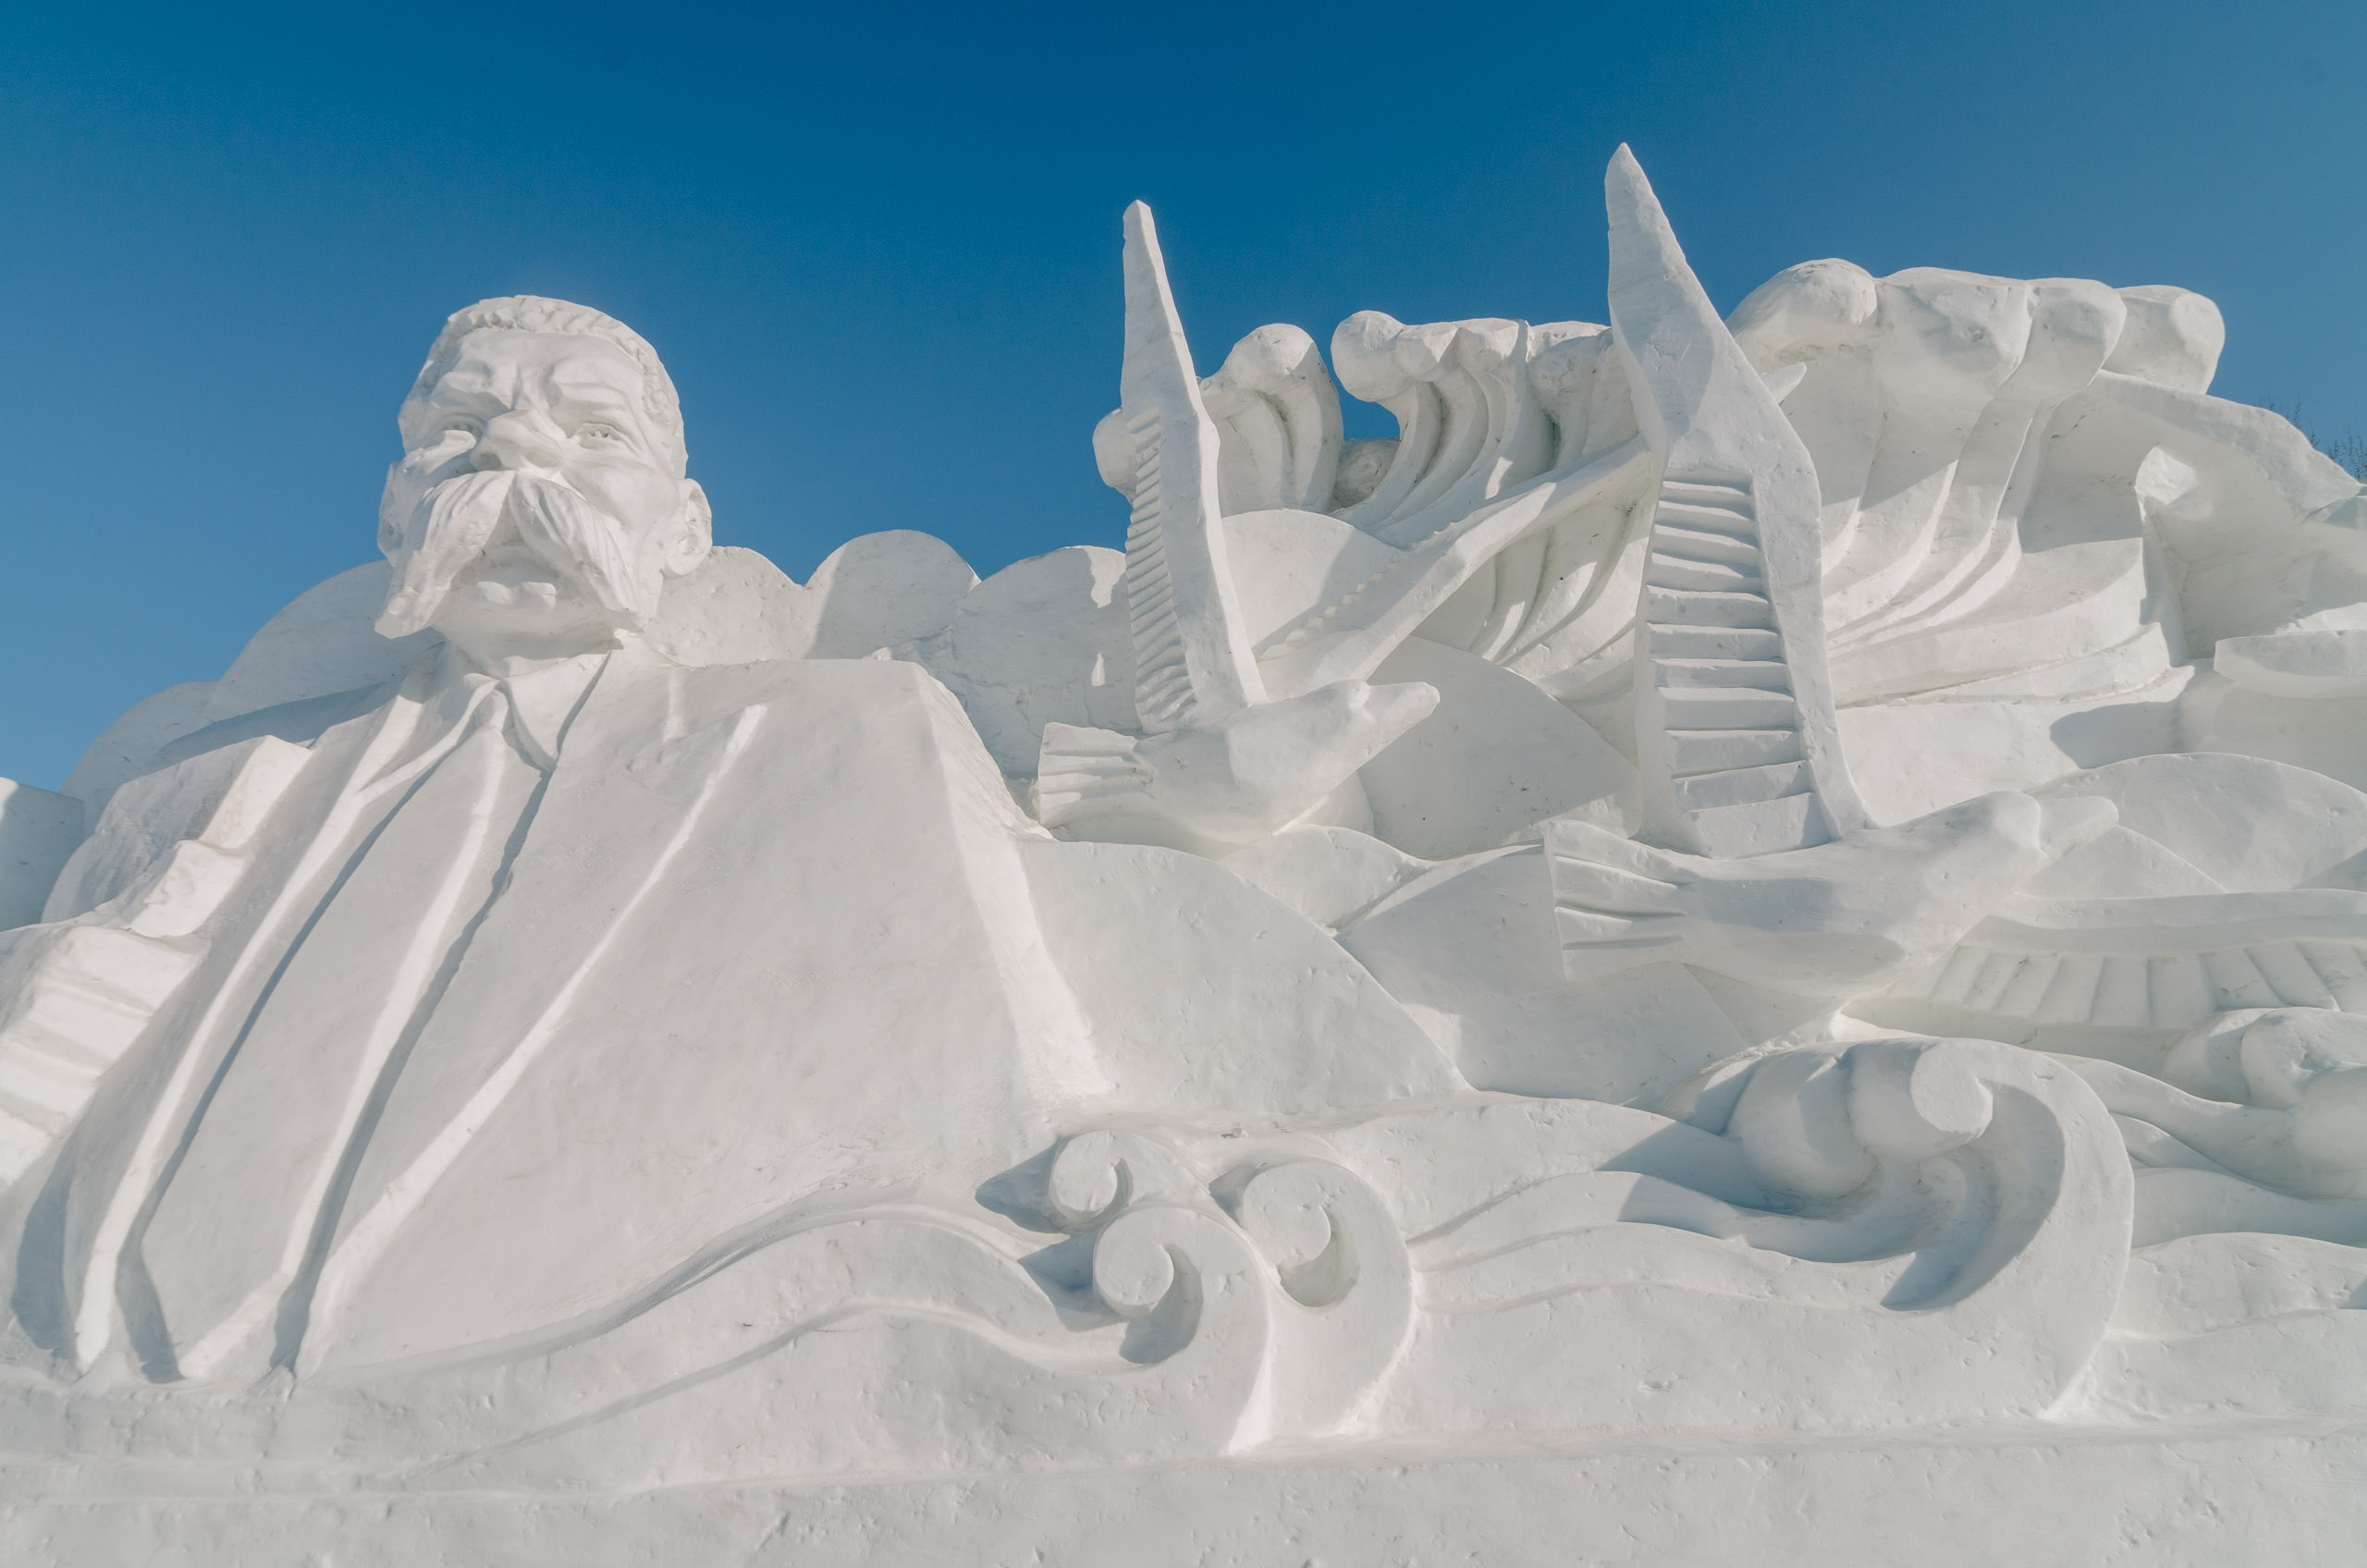 Harbin China Ice Festival - 2012-0108-DSC_2128